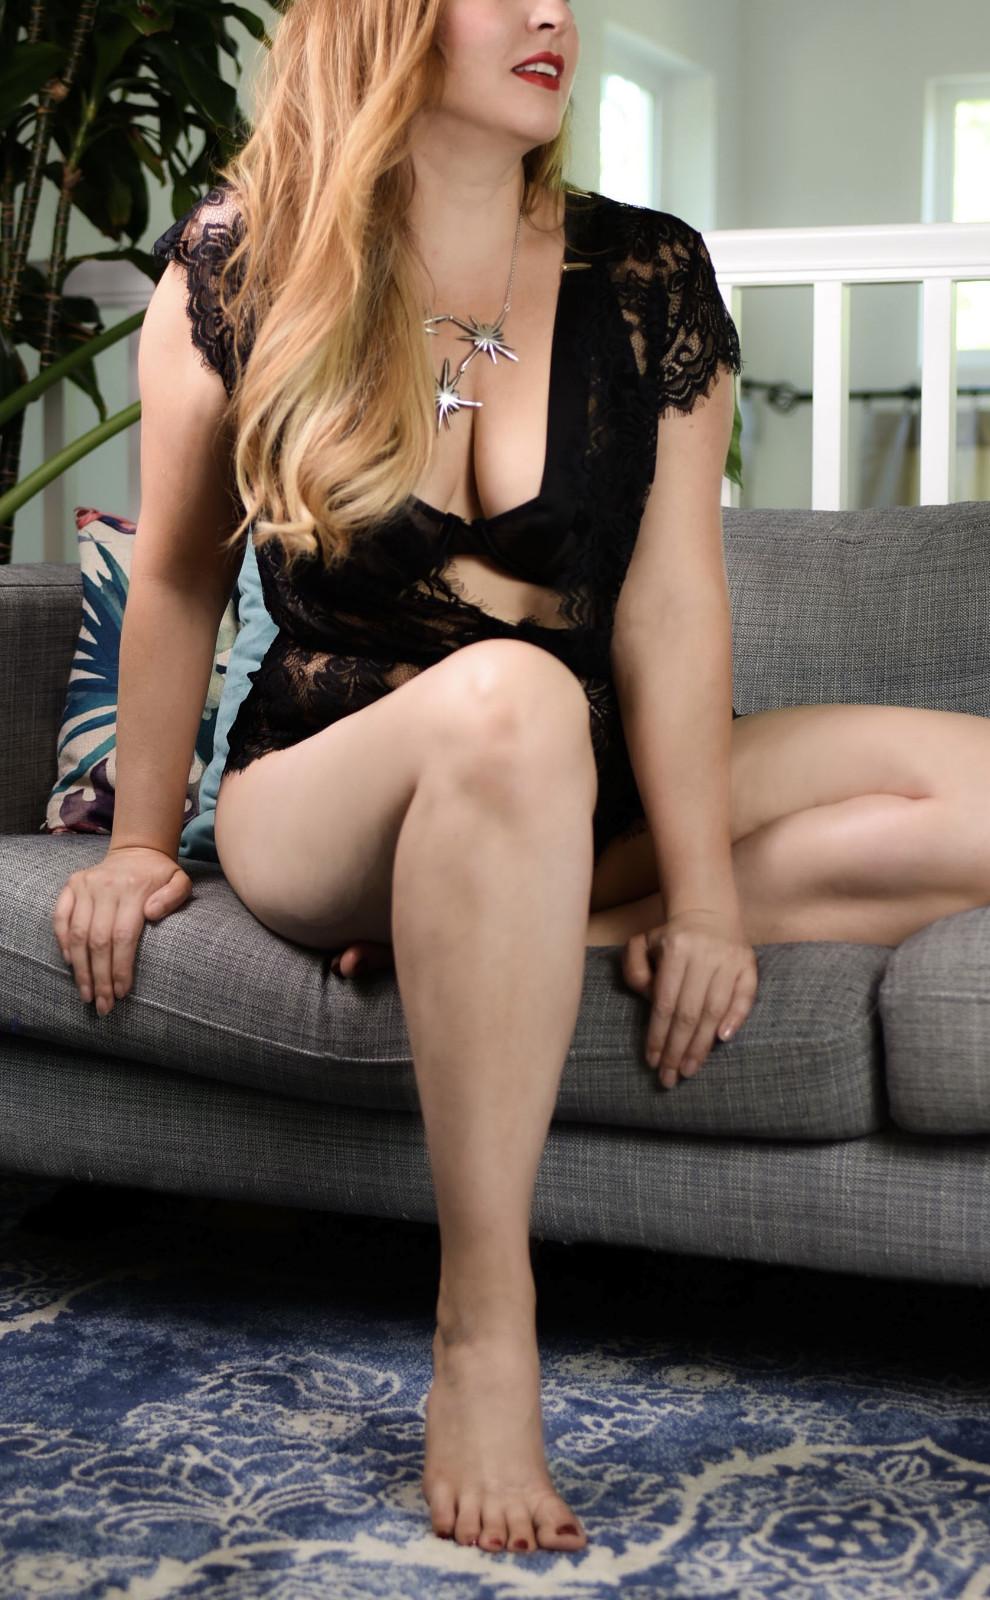 Caucasian. Upscale. Real photos. Real reviews. Sex lessons ;) in Santa Clara